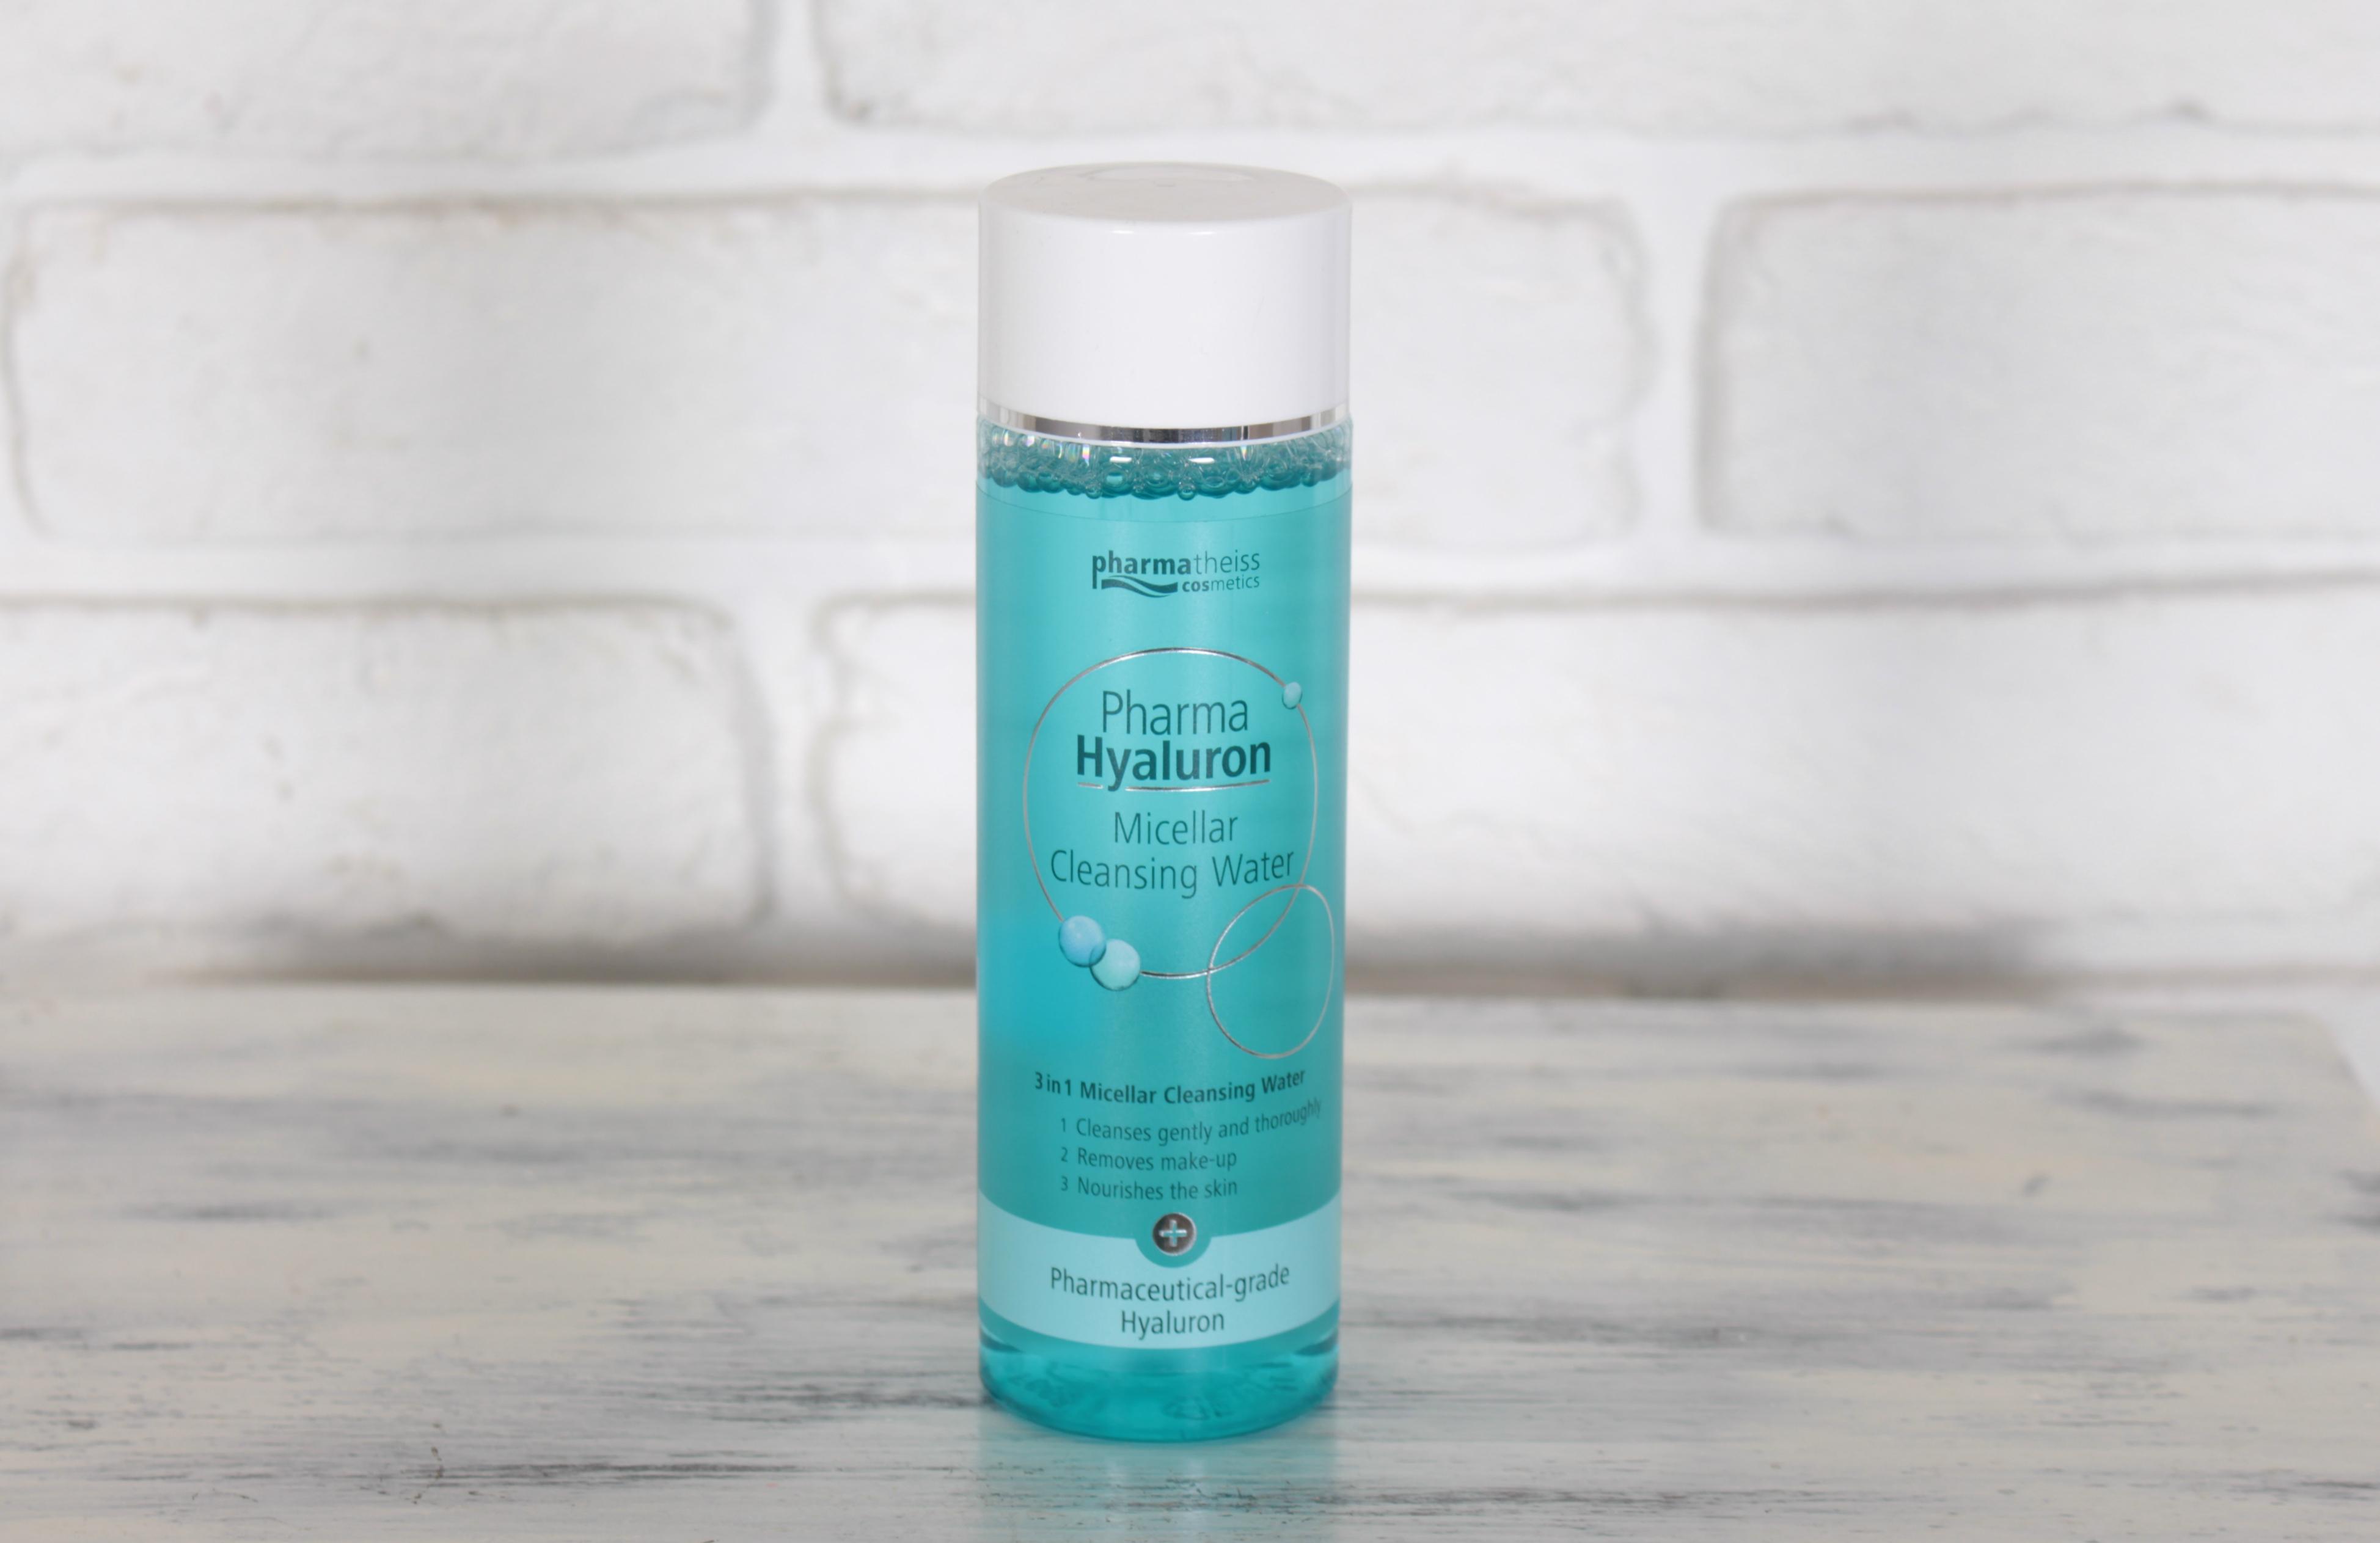 Pharmatheiss Cosmetics Pharma Hyaluron Micellar Cleansing Water Мицеллярная вода